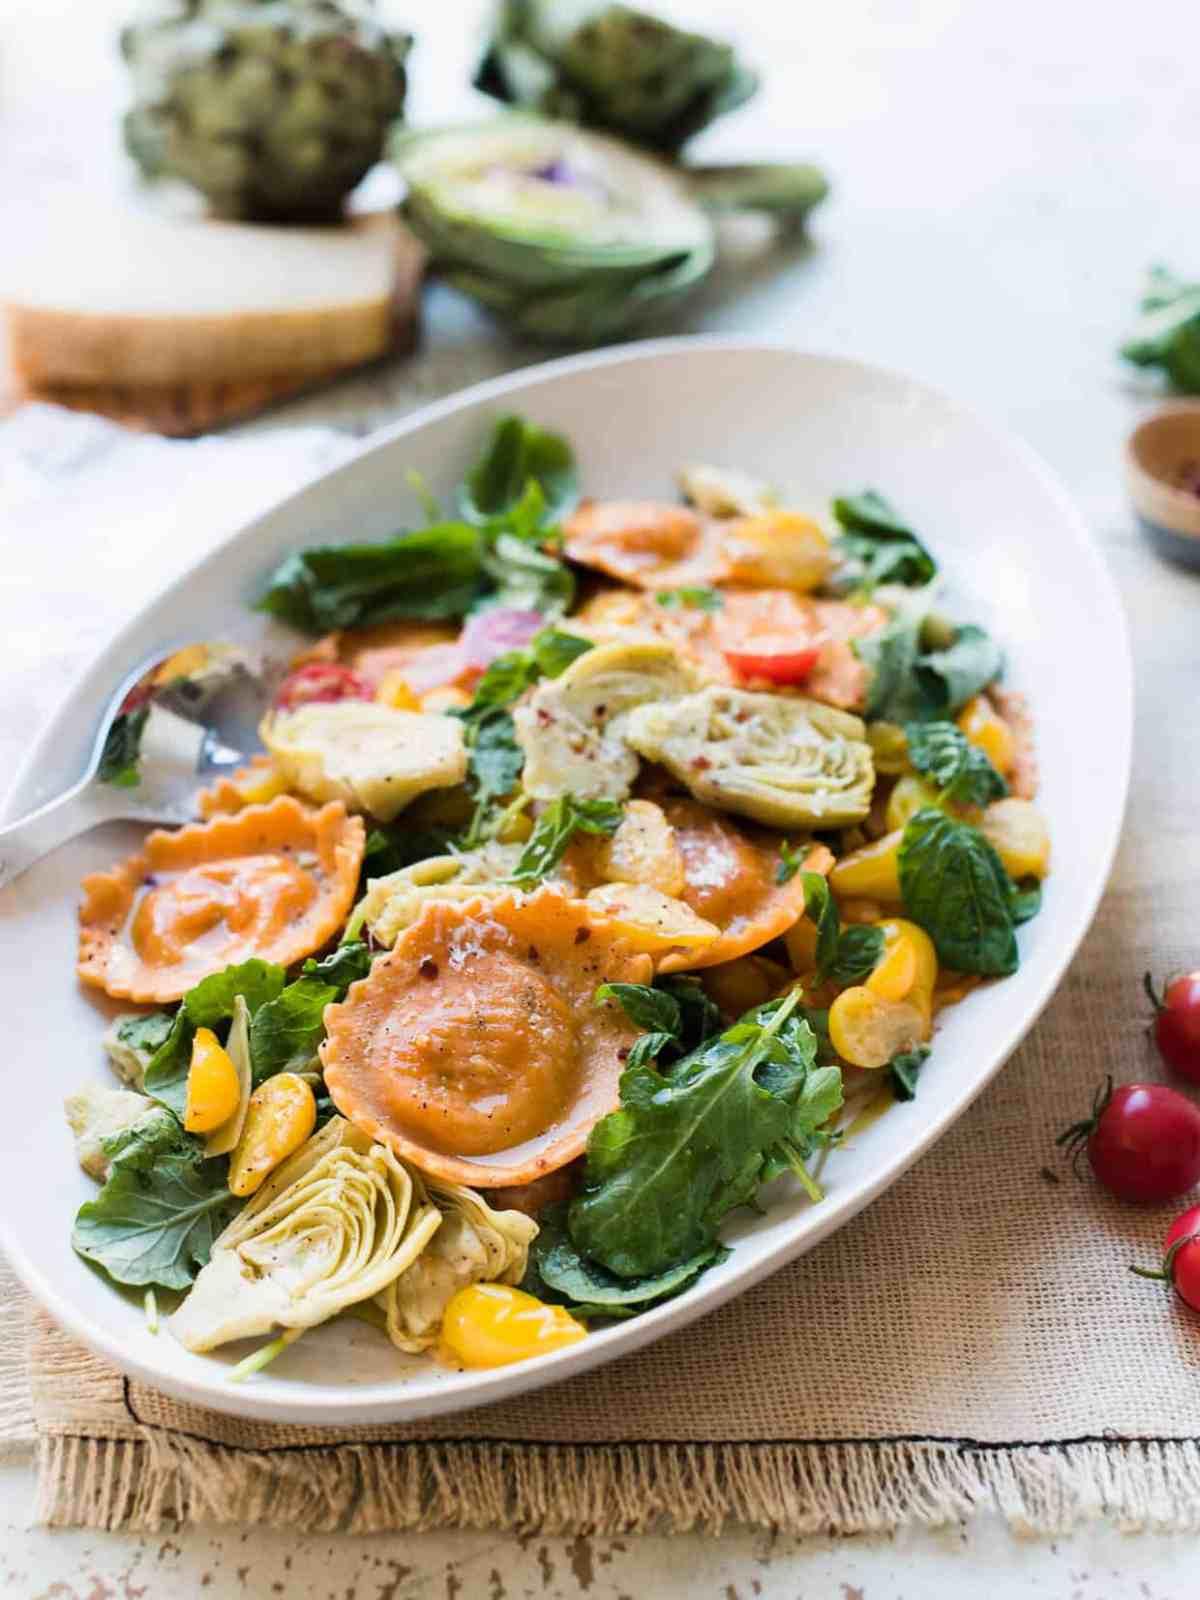 Platter of Tomato and Mozzarella Ravioli with fresh tomatoes, baby kale and artichokes.